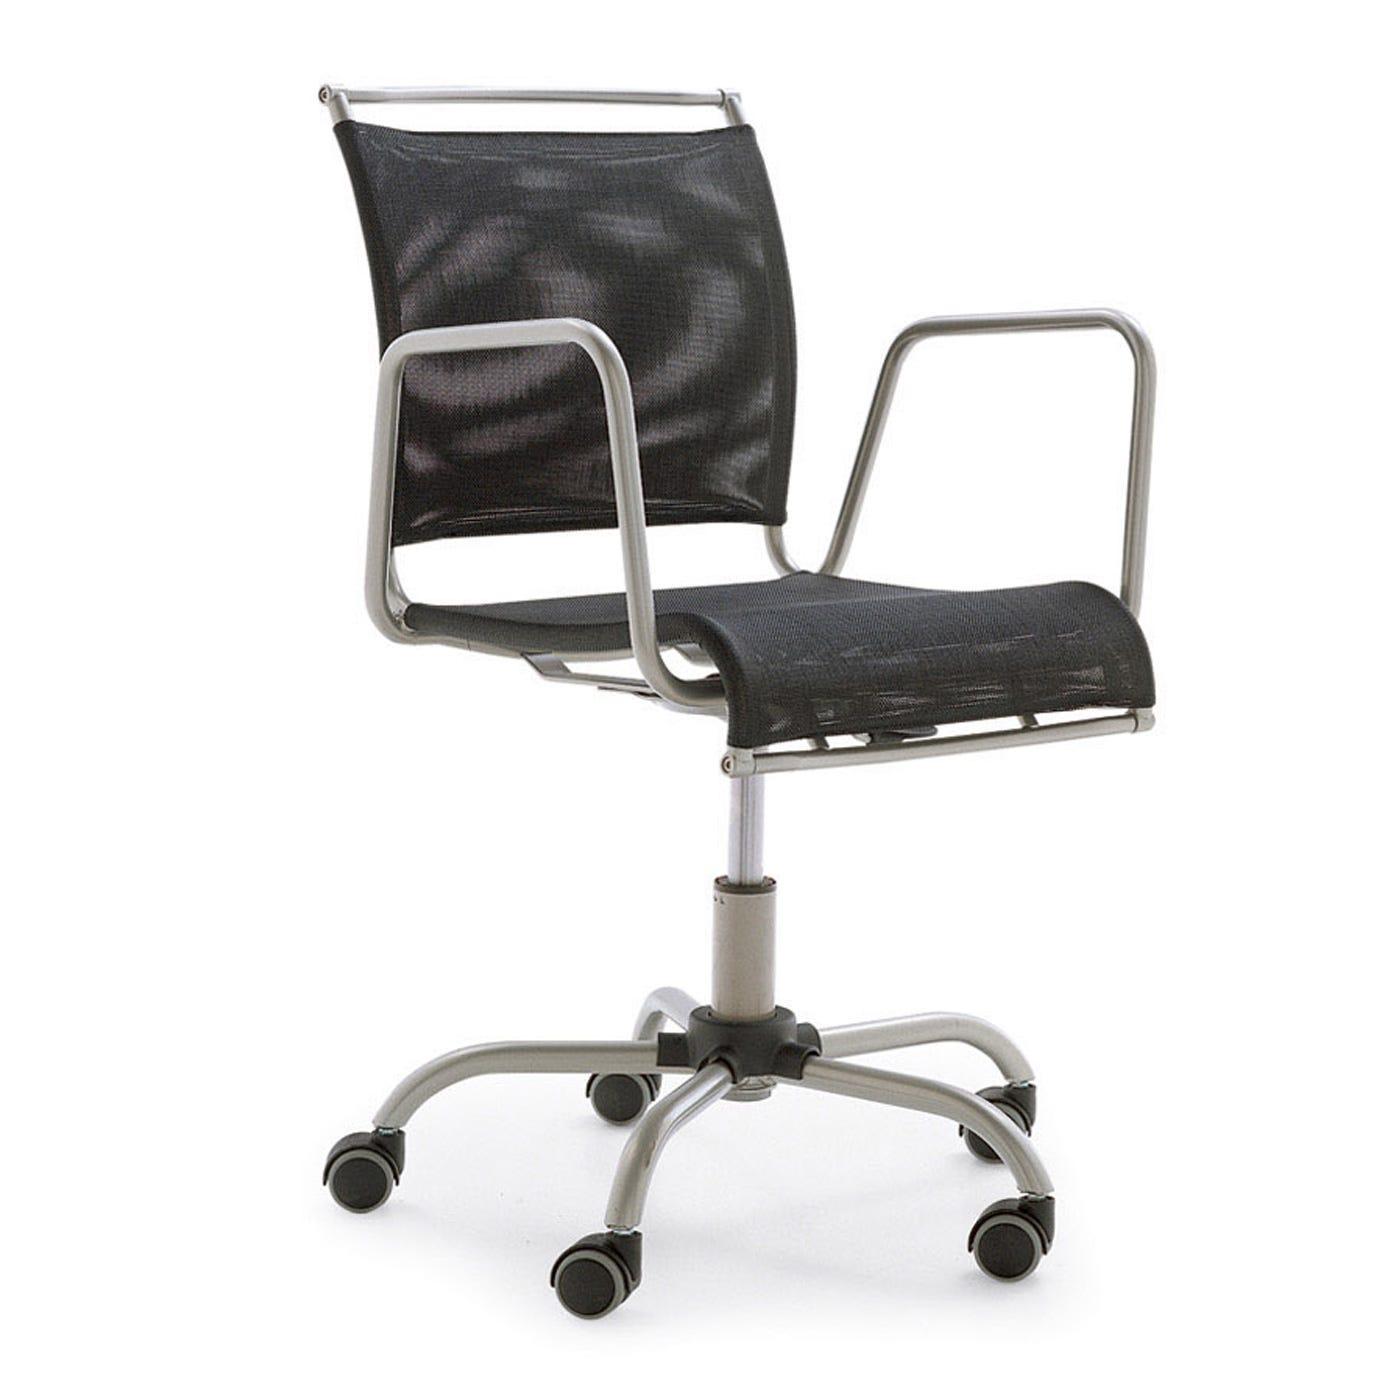 Air Race Office Chair Net Black - Warehouse Sale